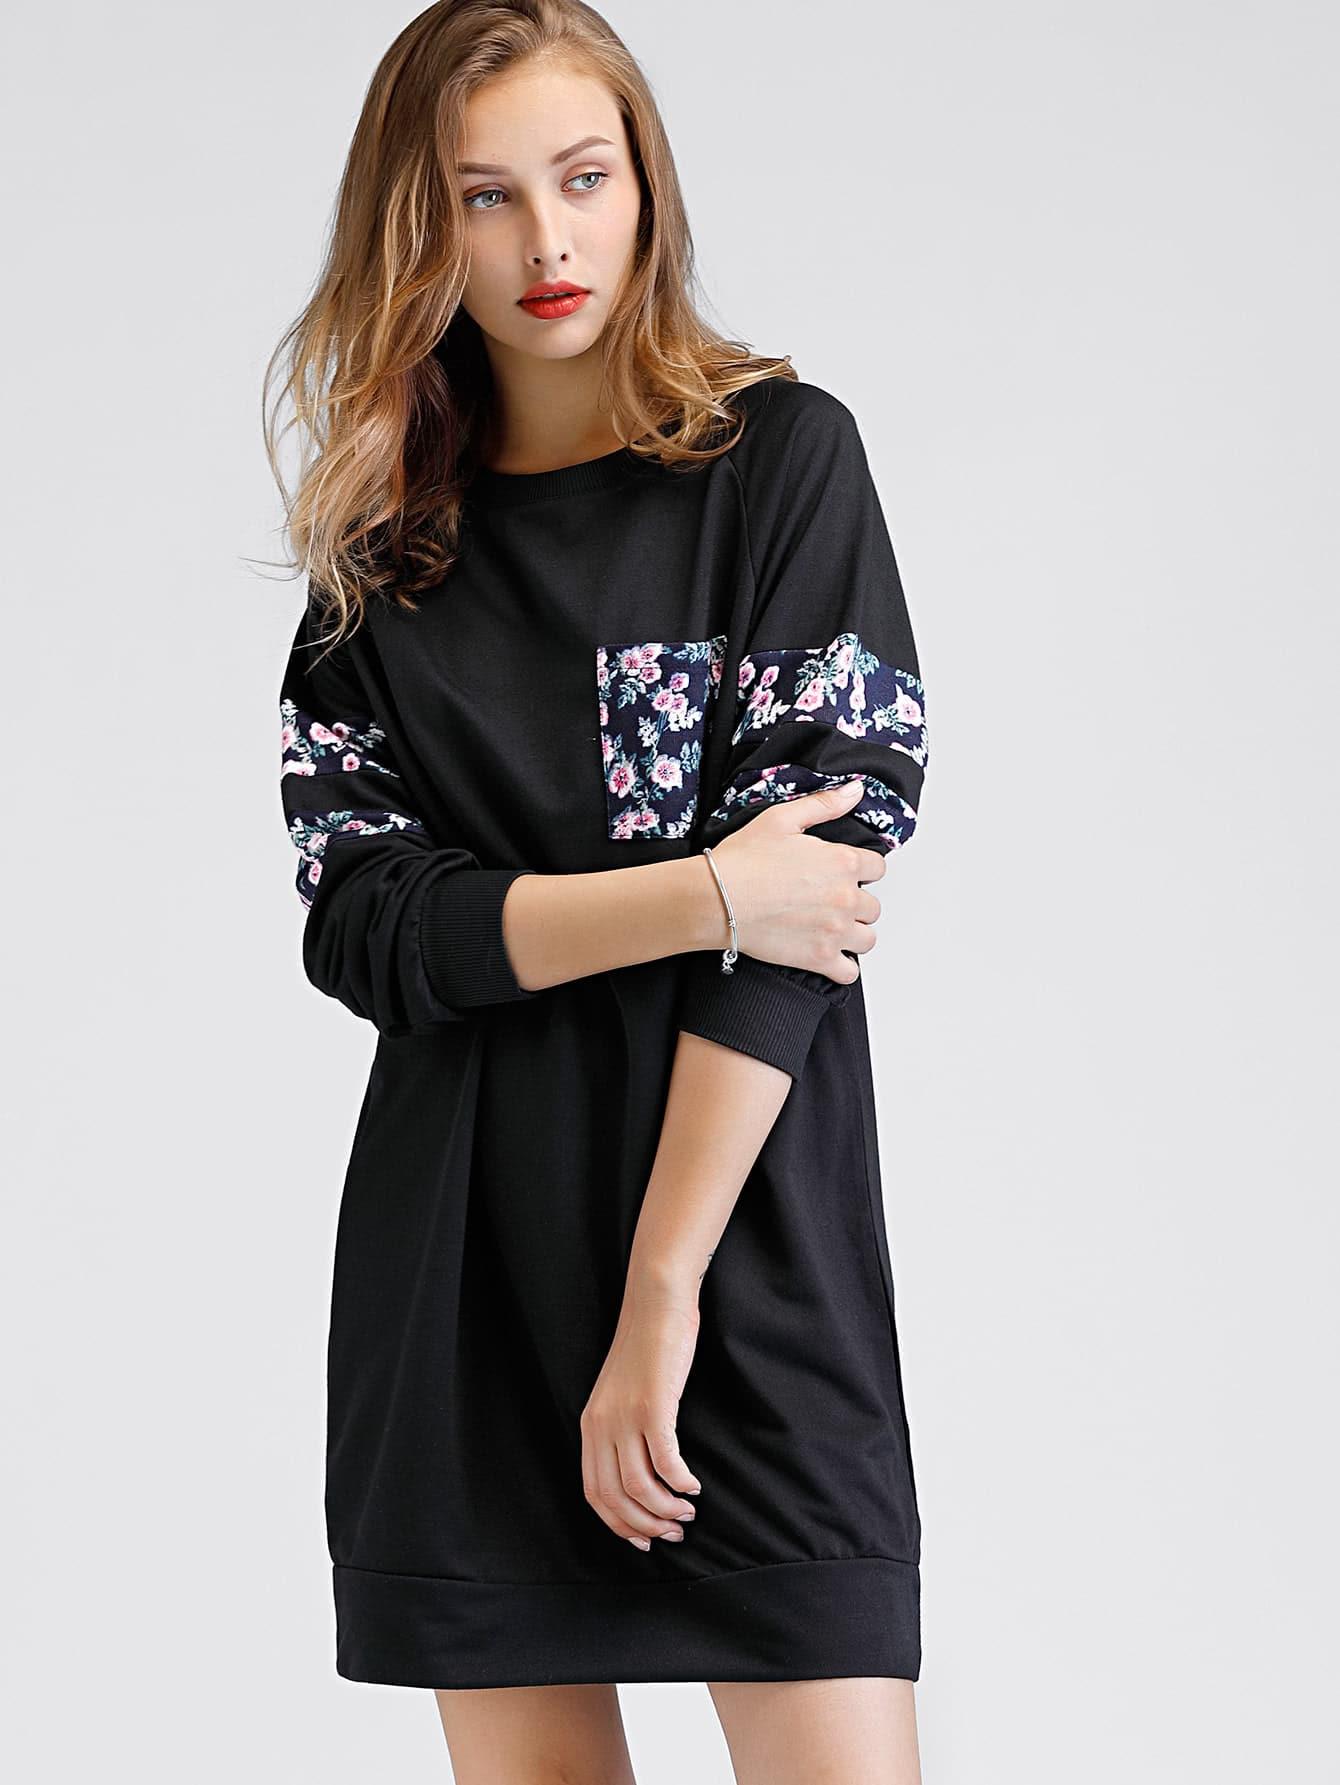 Contrast Panel Raglan Sleeve Sweatshirt Dress dress170815103